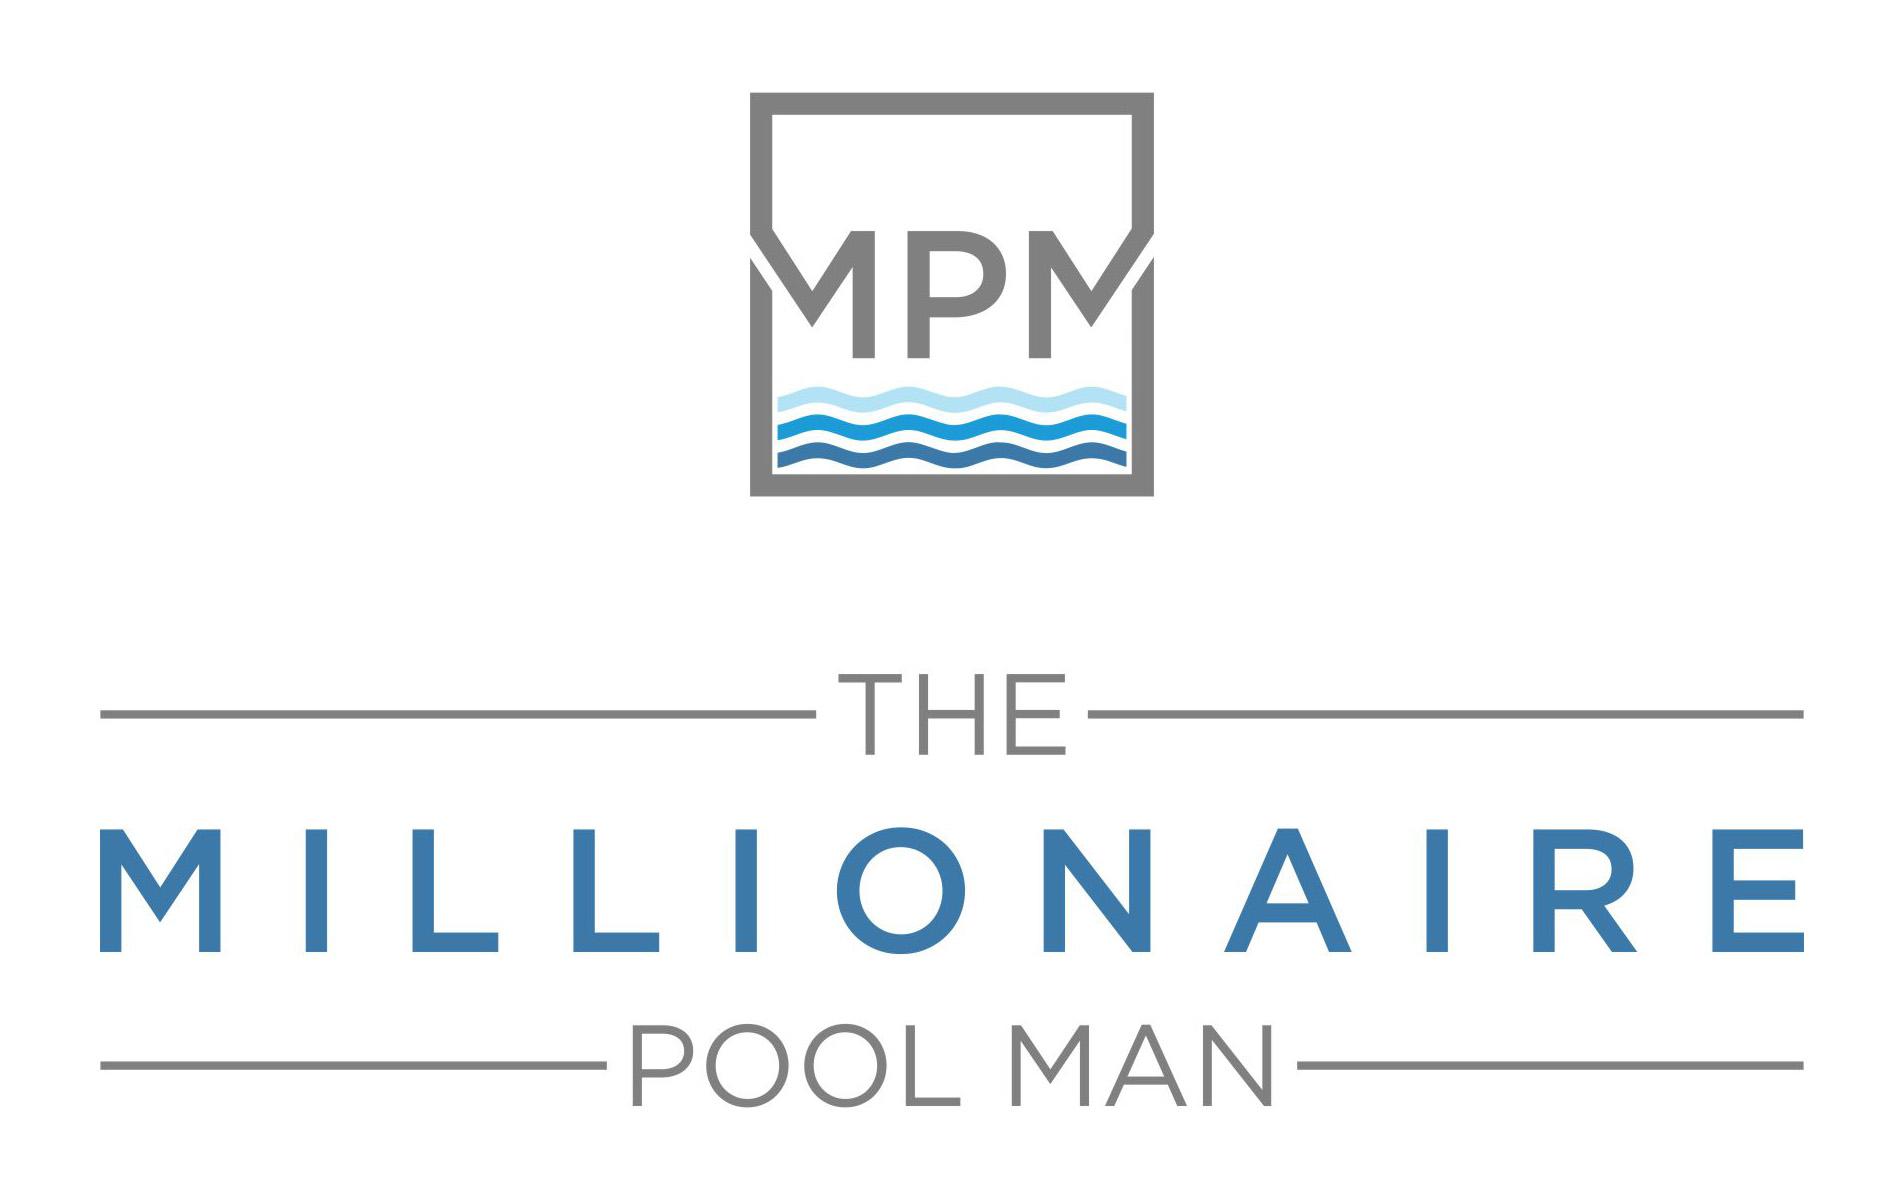 The Millionaire Pool Man The Millionaire Pool Man Program